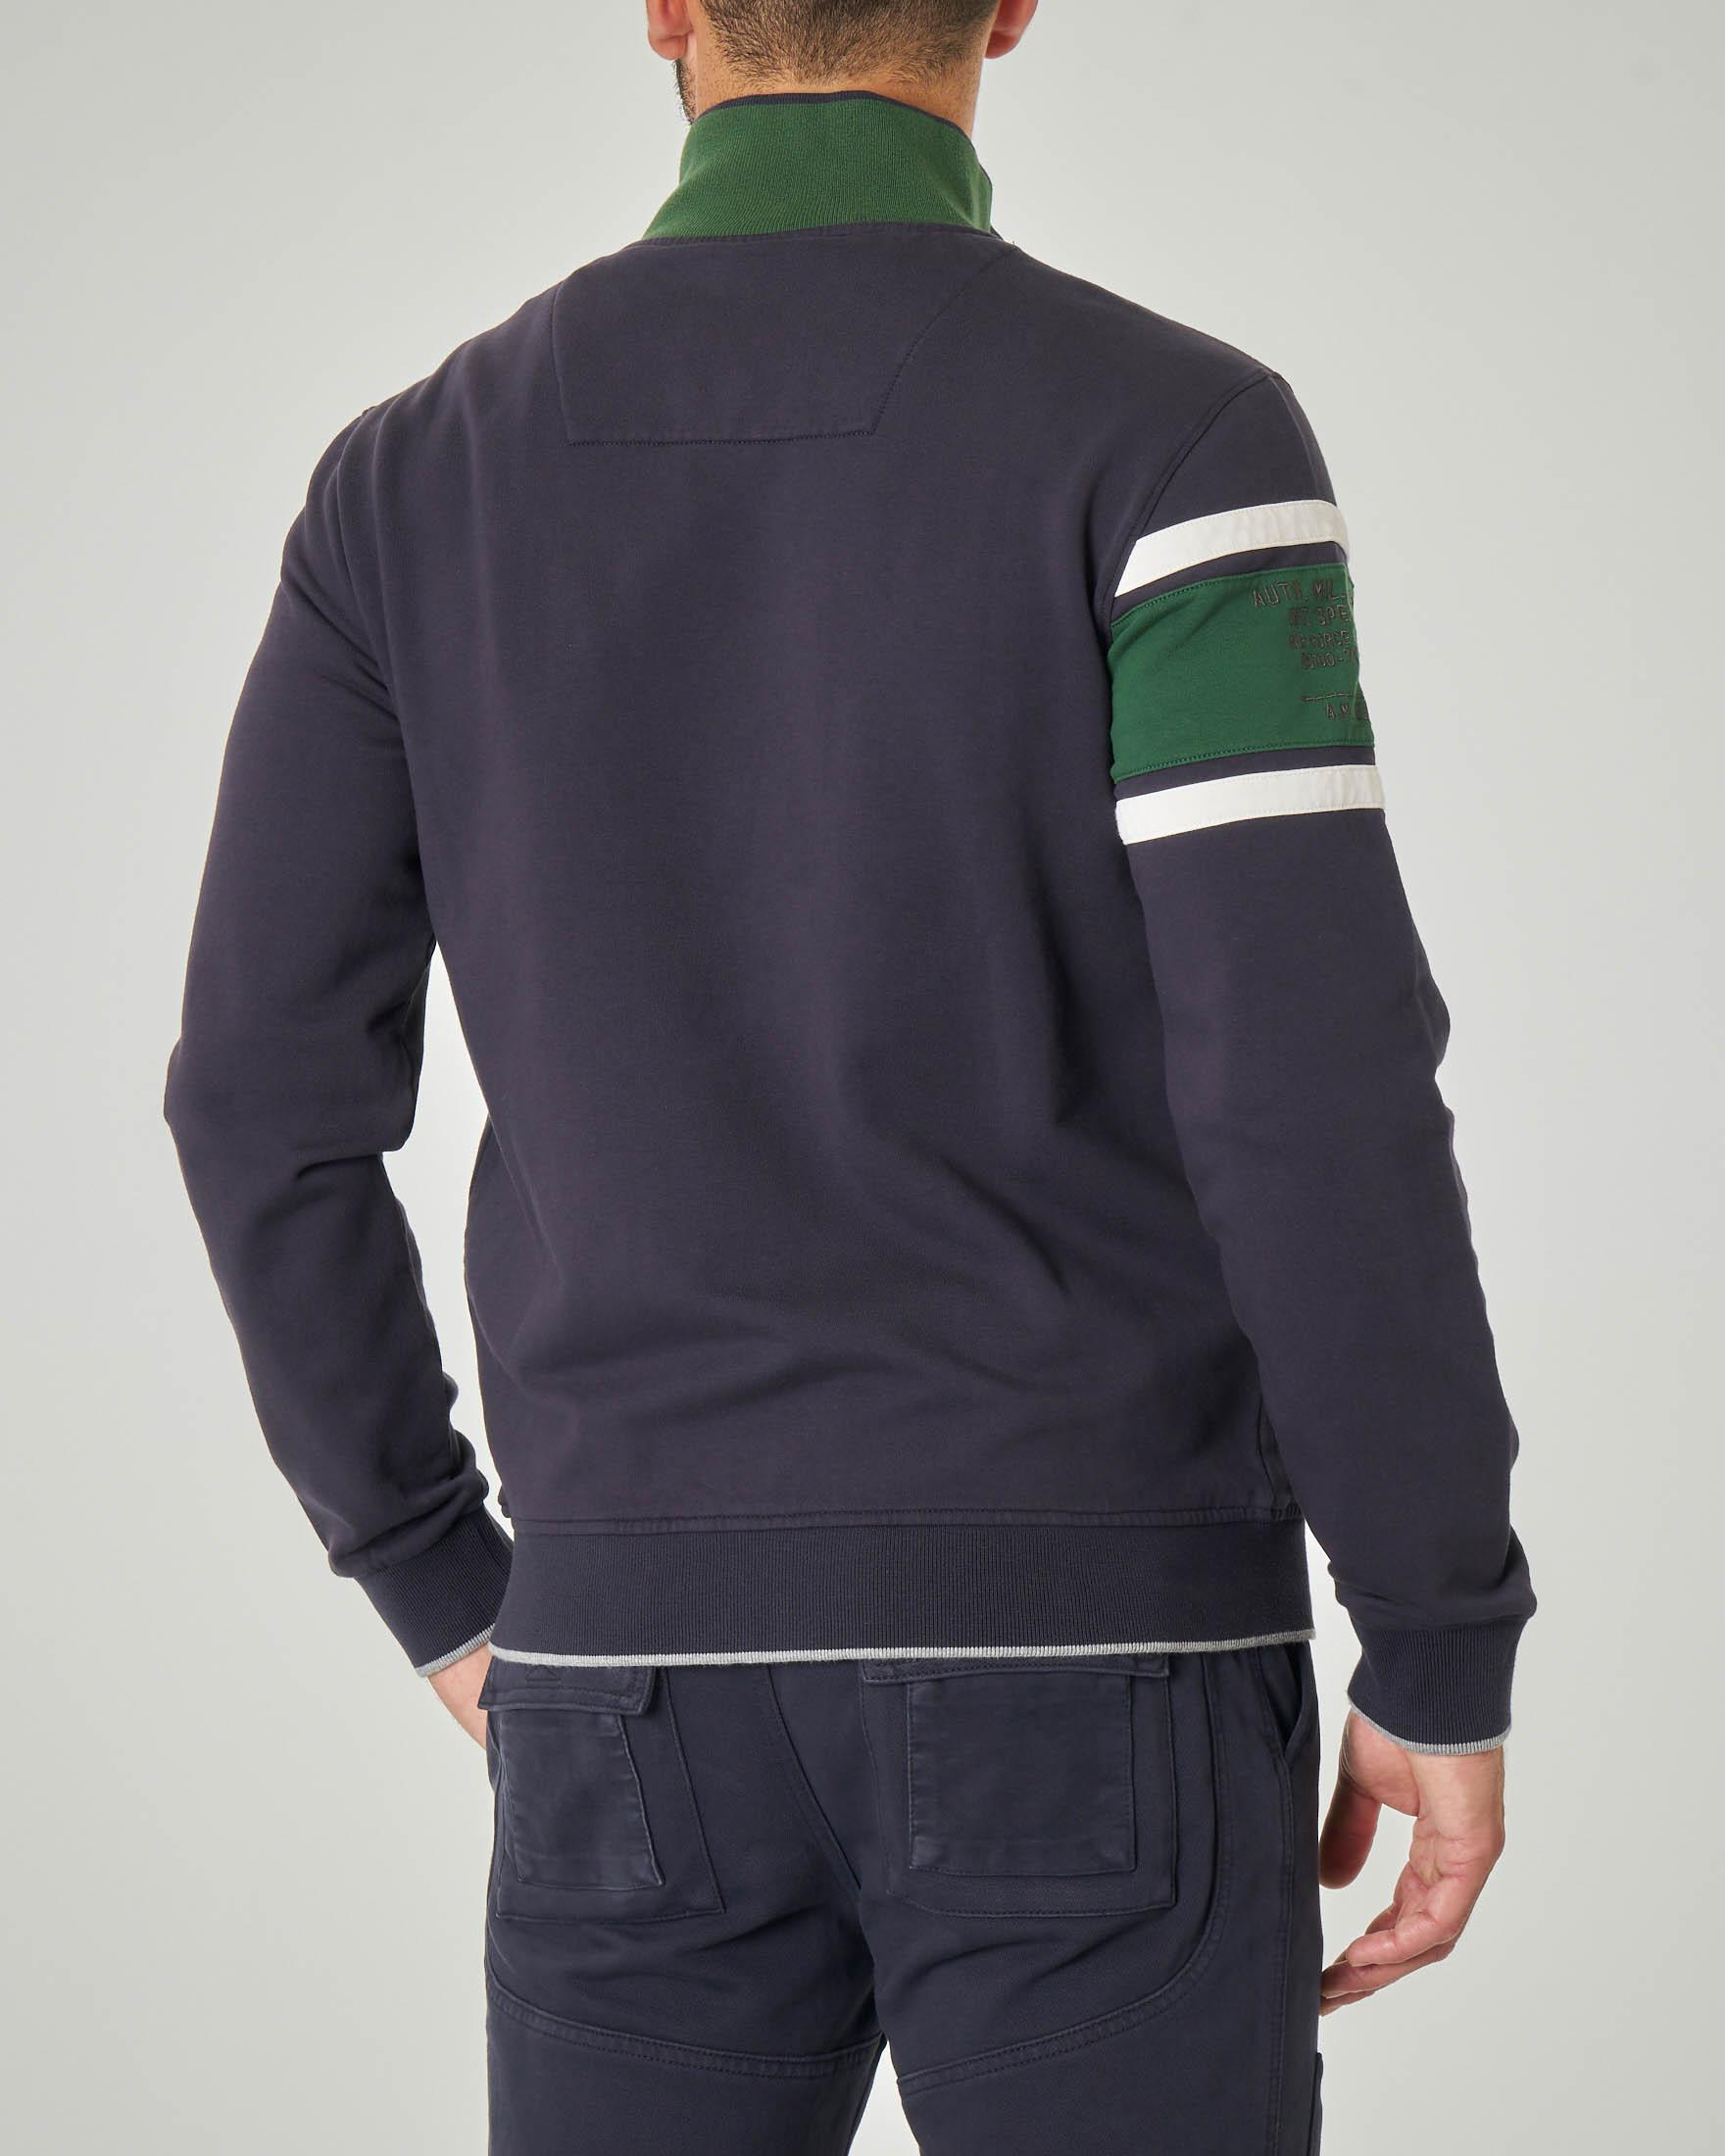 Felpa blu e verde con chiusura zip